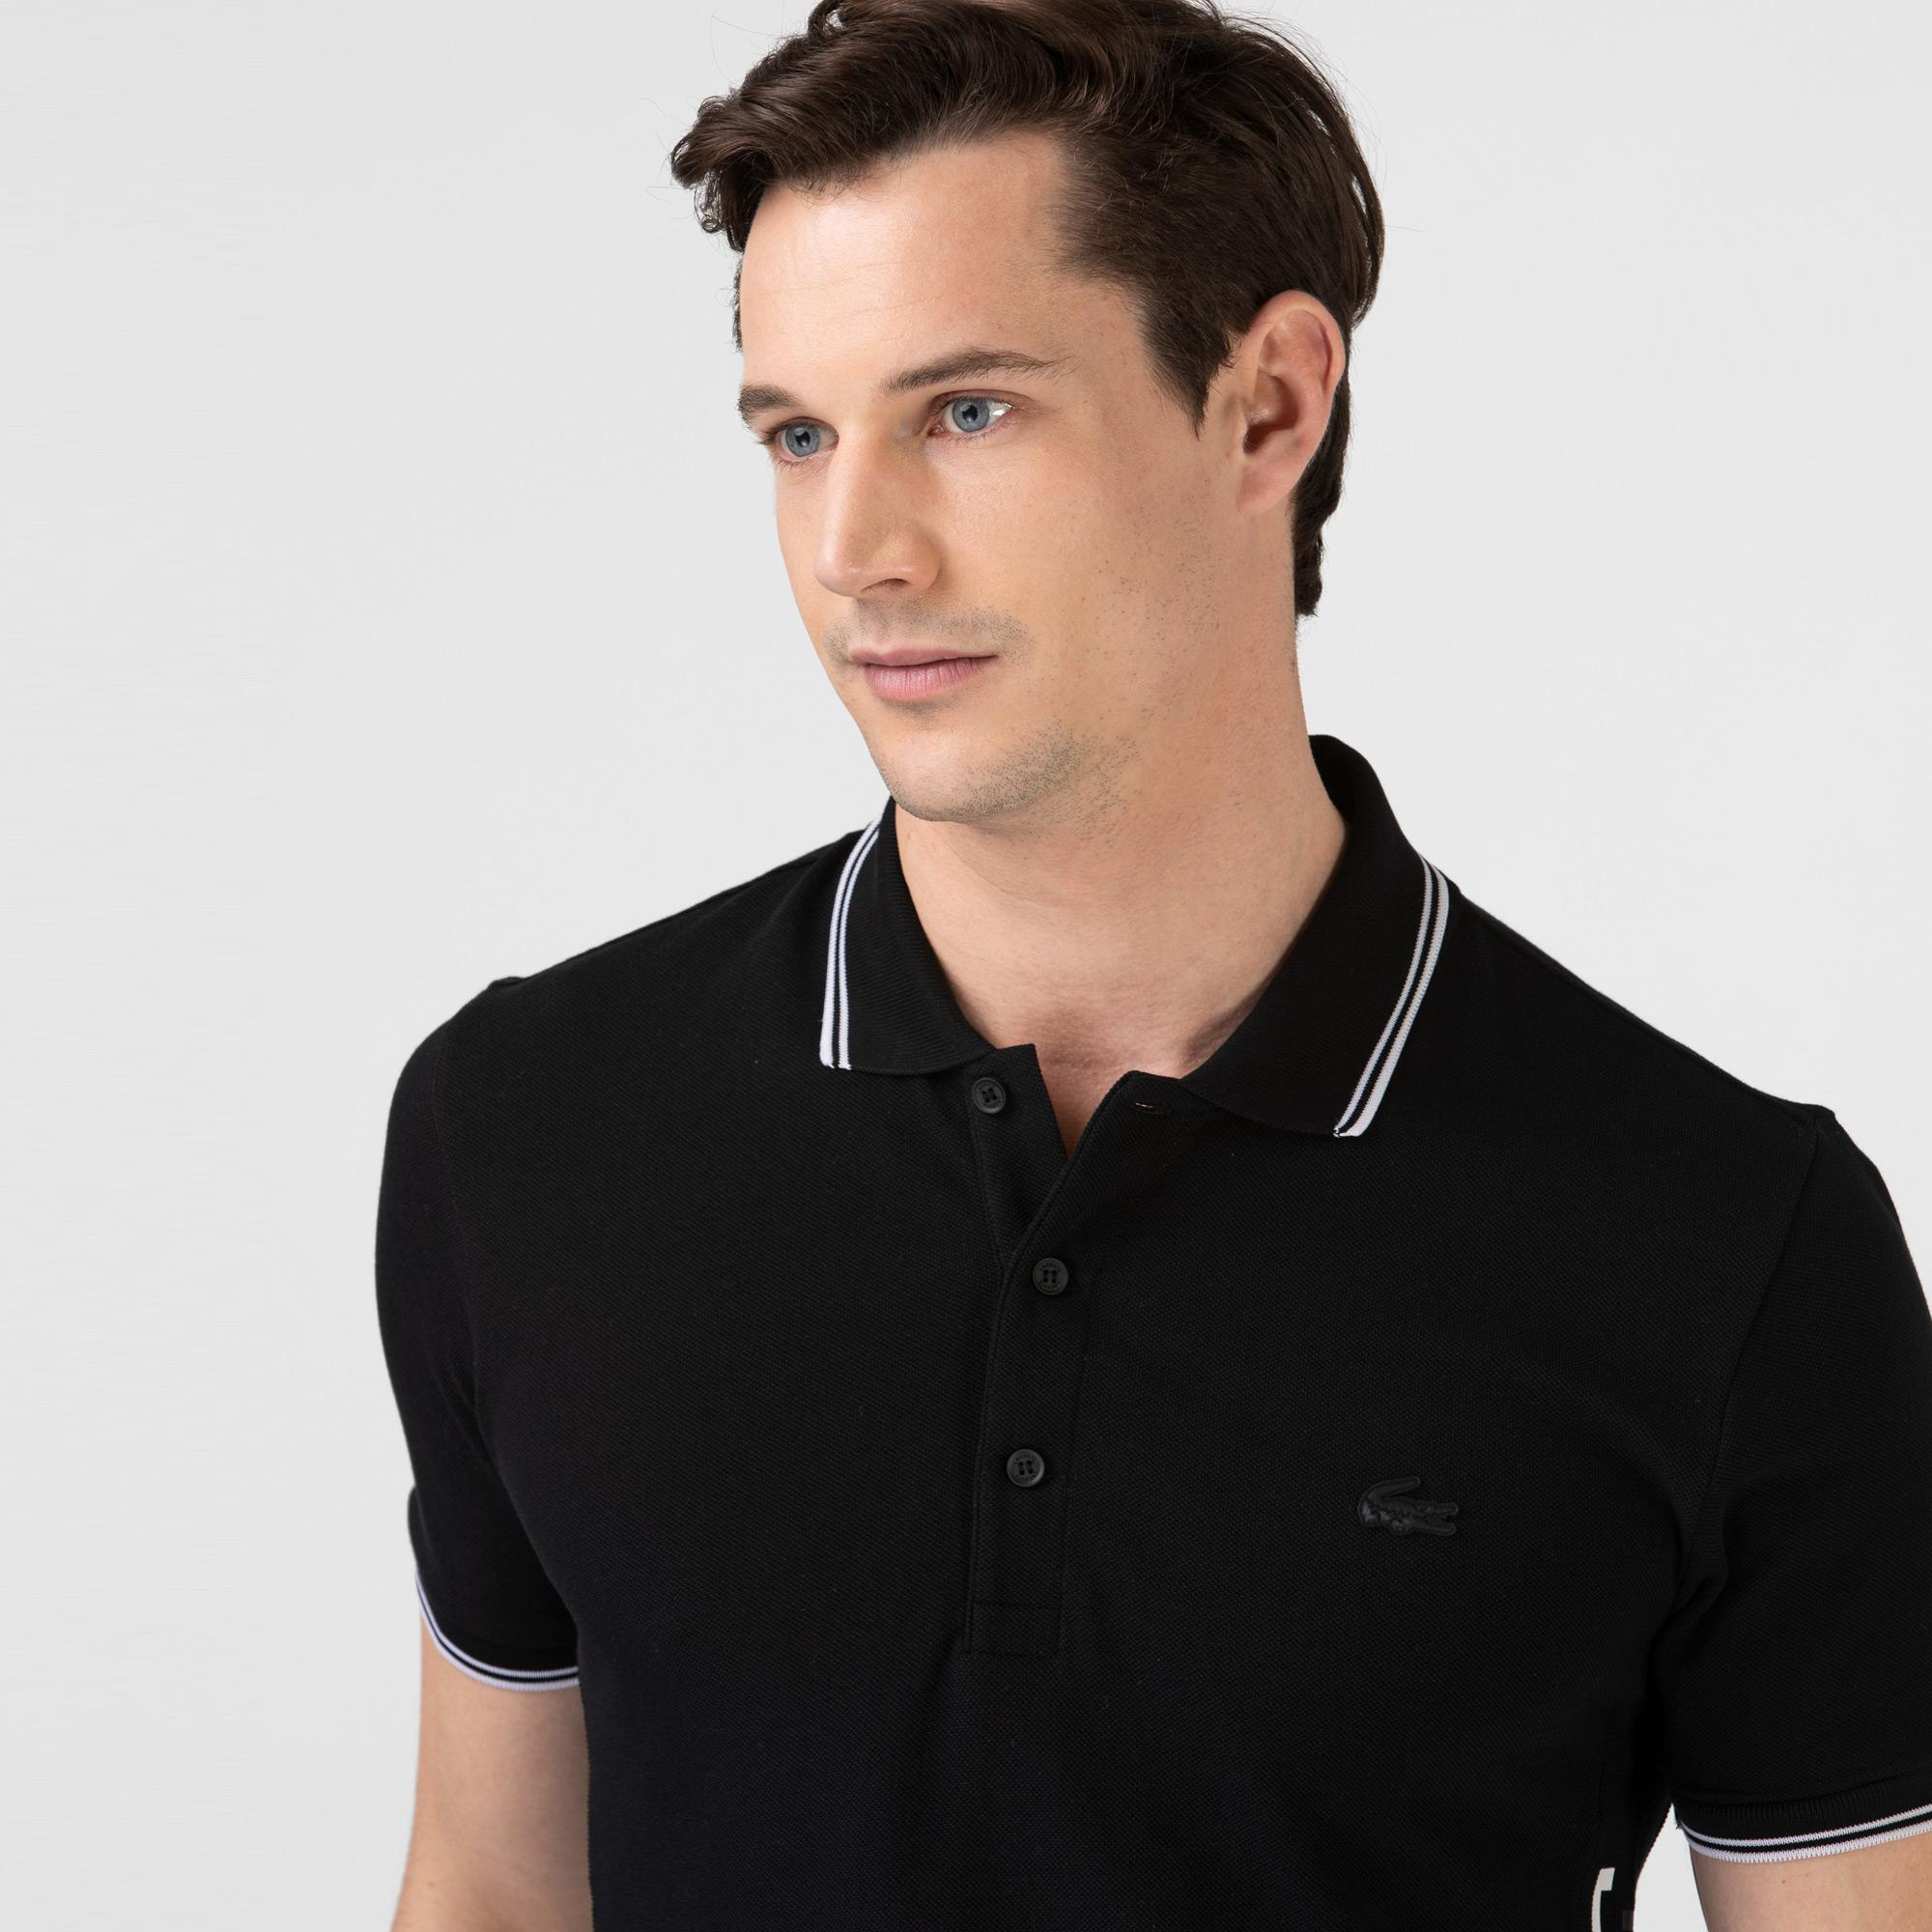 Lacoste Erkek Slim Fit Renk Bloklu Siyah Polo